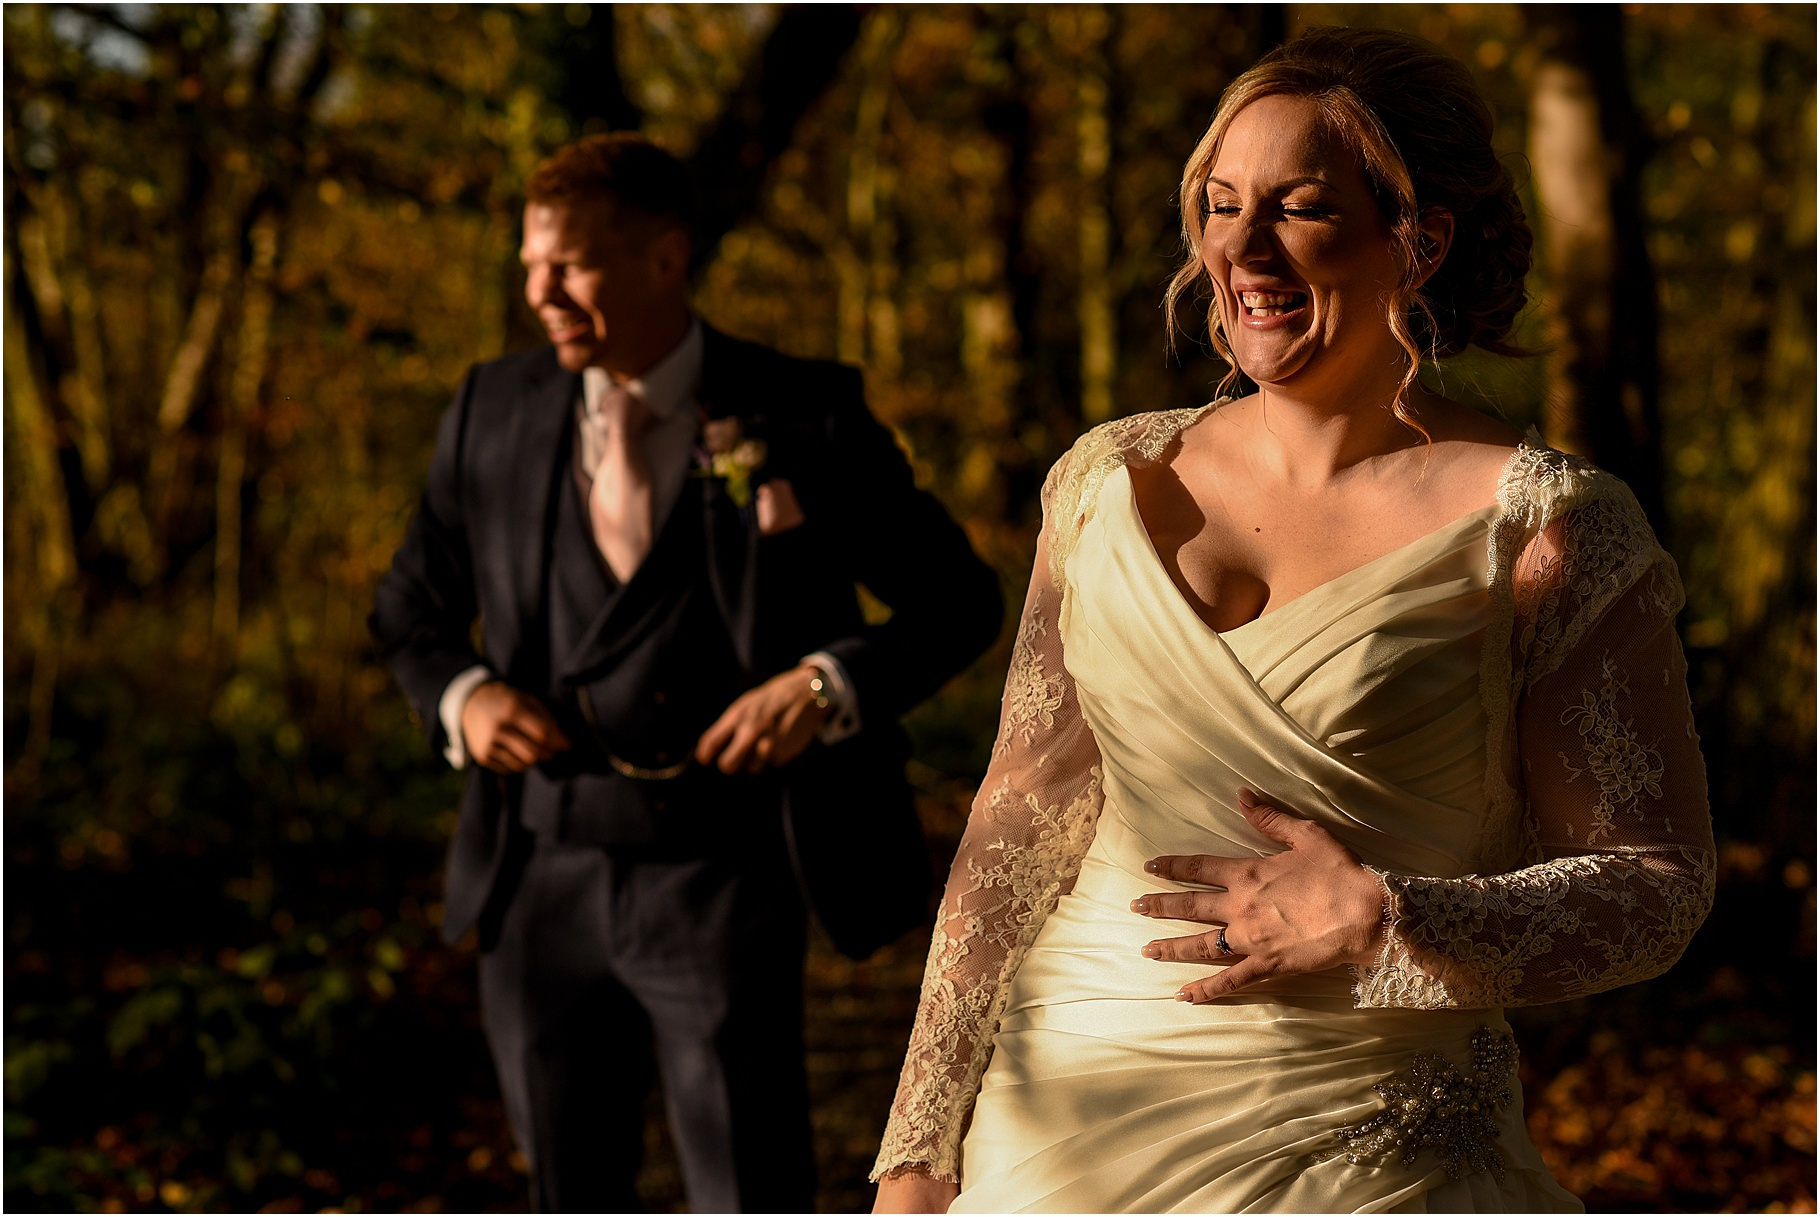 dan-wootton-photography-2017-weddings-121.jpg